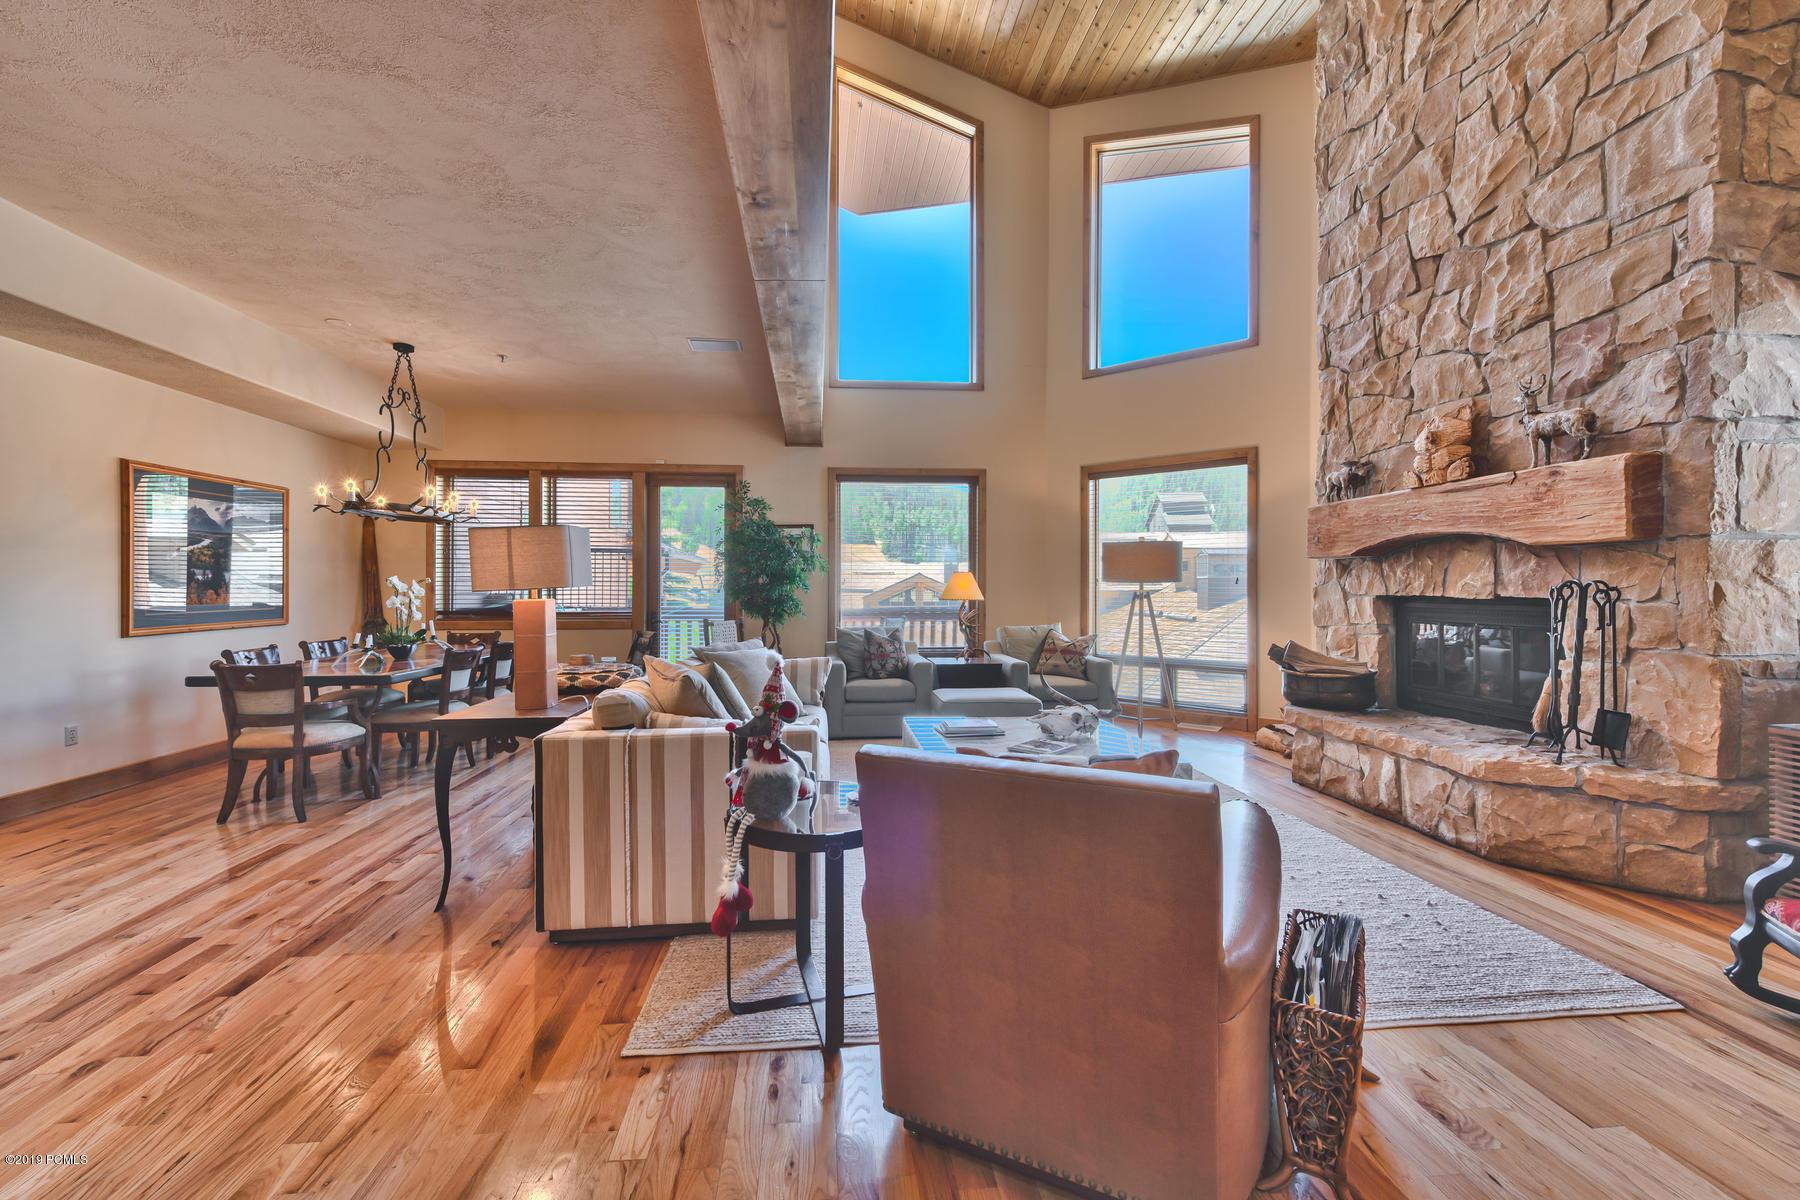 7660 Royal Street, Park City, Utah 84060, 3 Bedrooms Bedrooms, ,4 BathroomsBathrooms,Condominium,For Sale,Royal,20190109112430415765000000